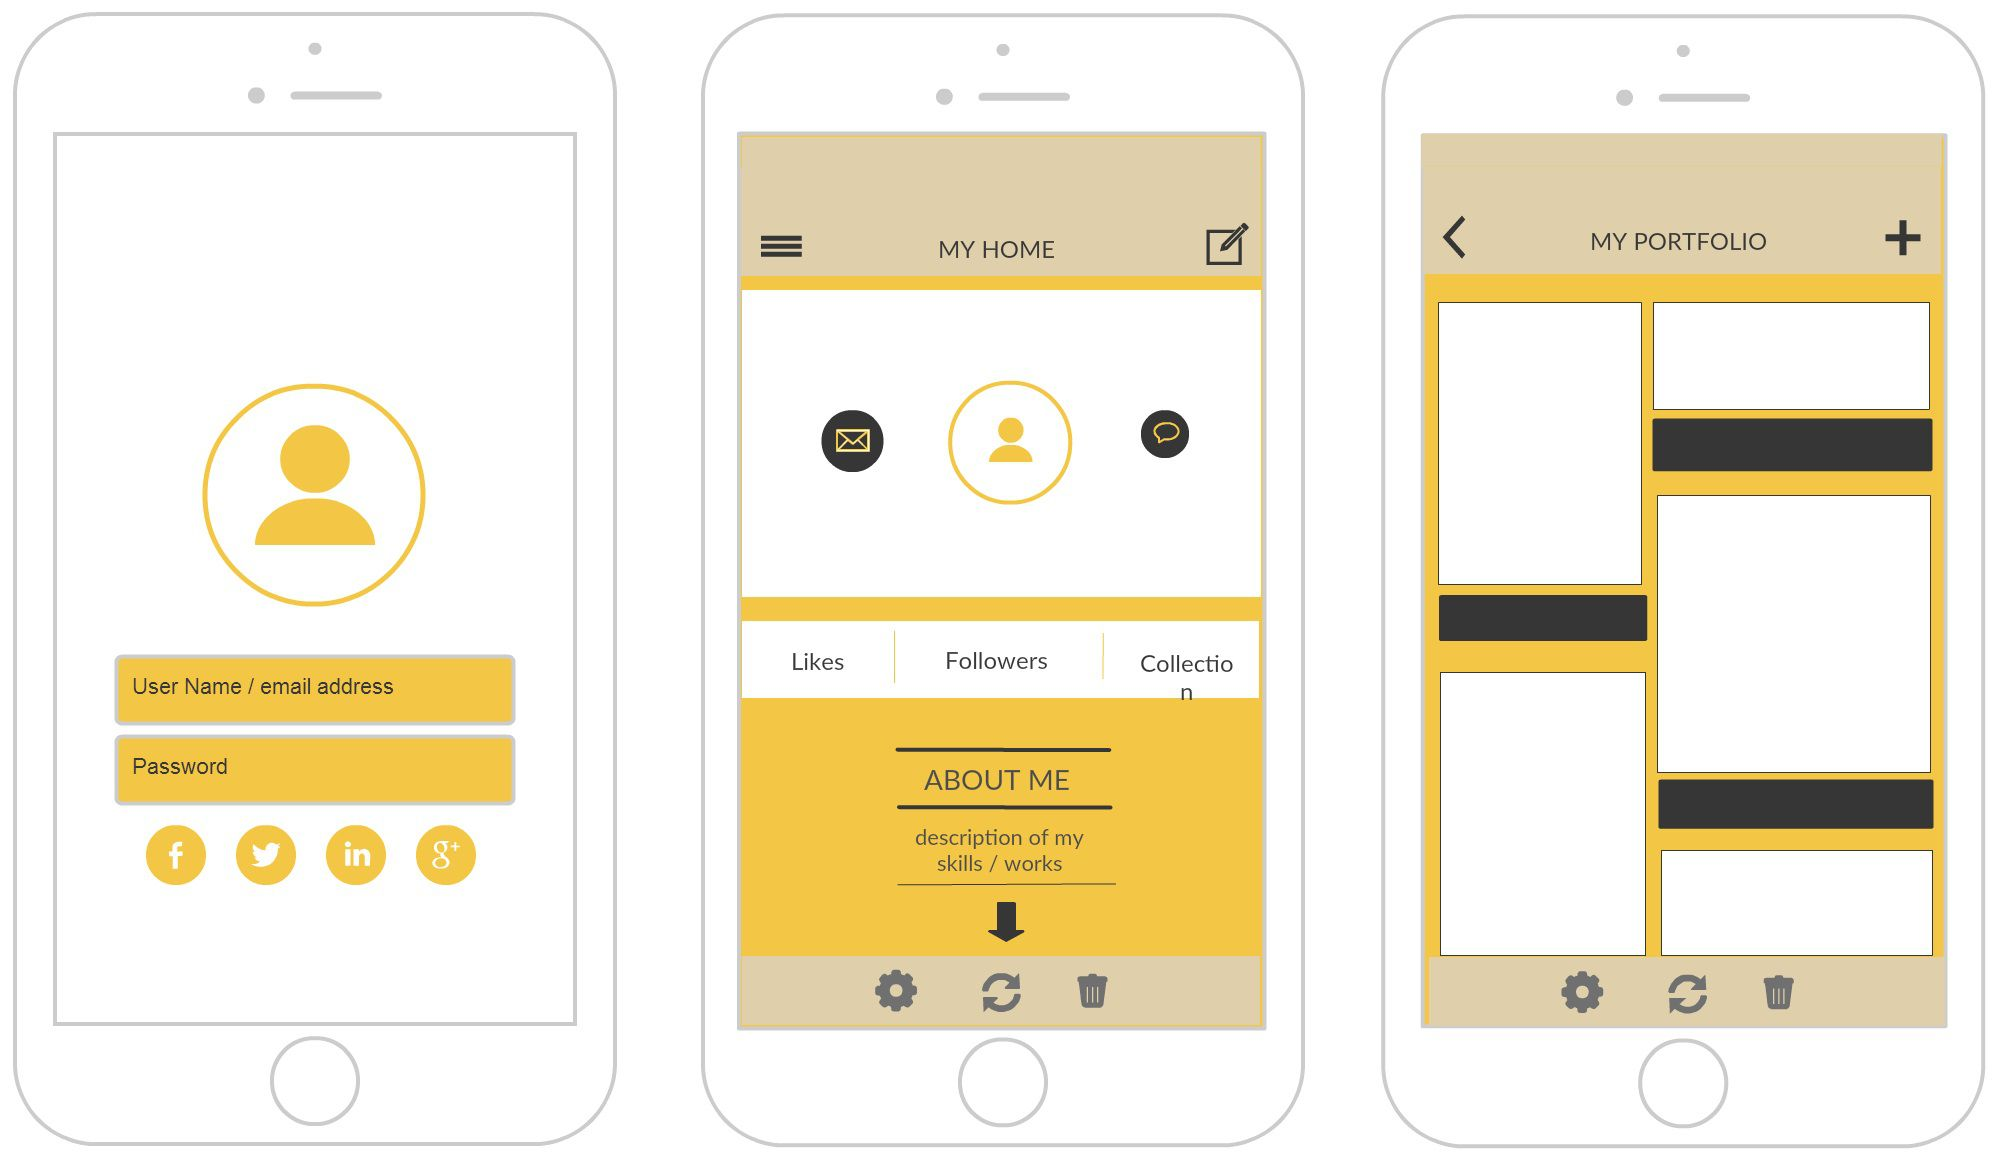 006 Stunning Iphone App Design Template Inspiration  X Io SketchFull